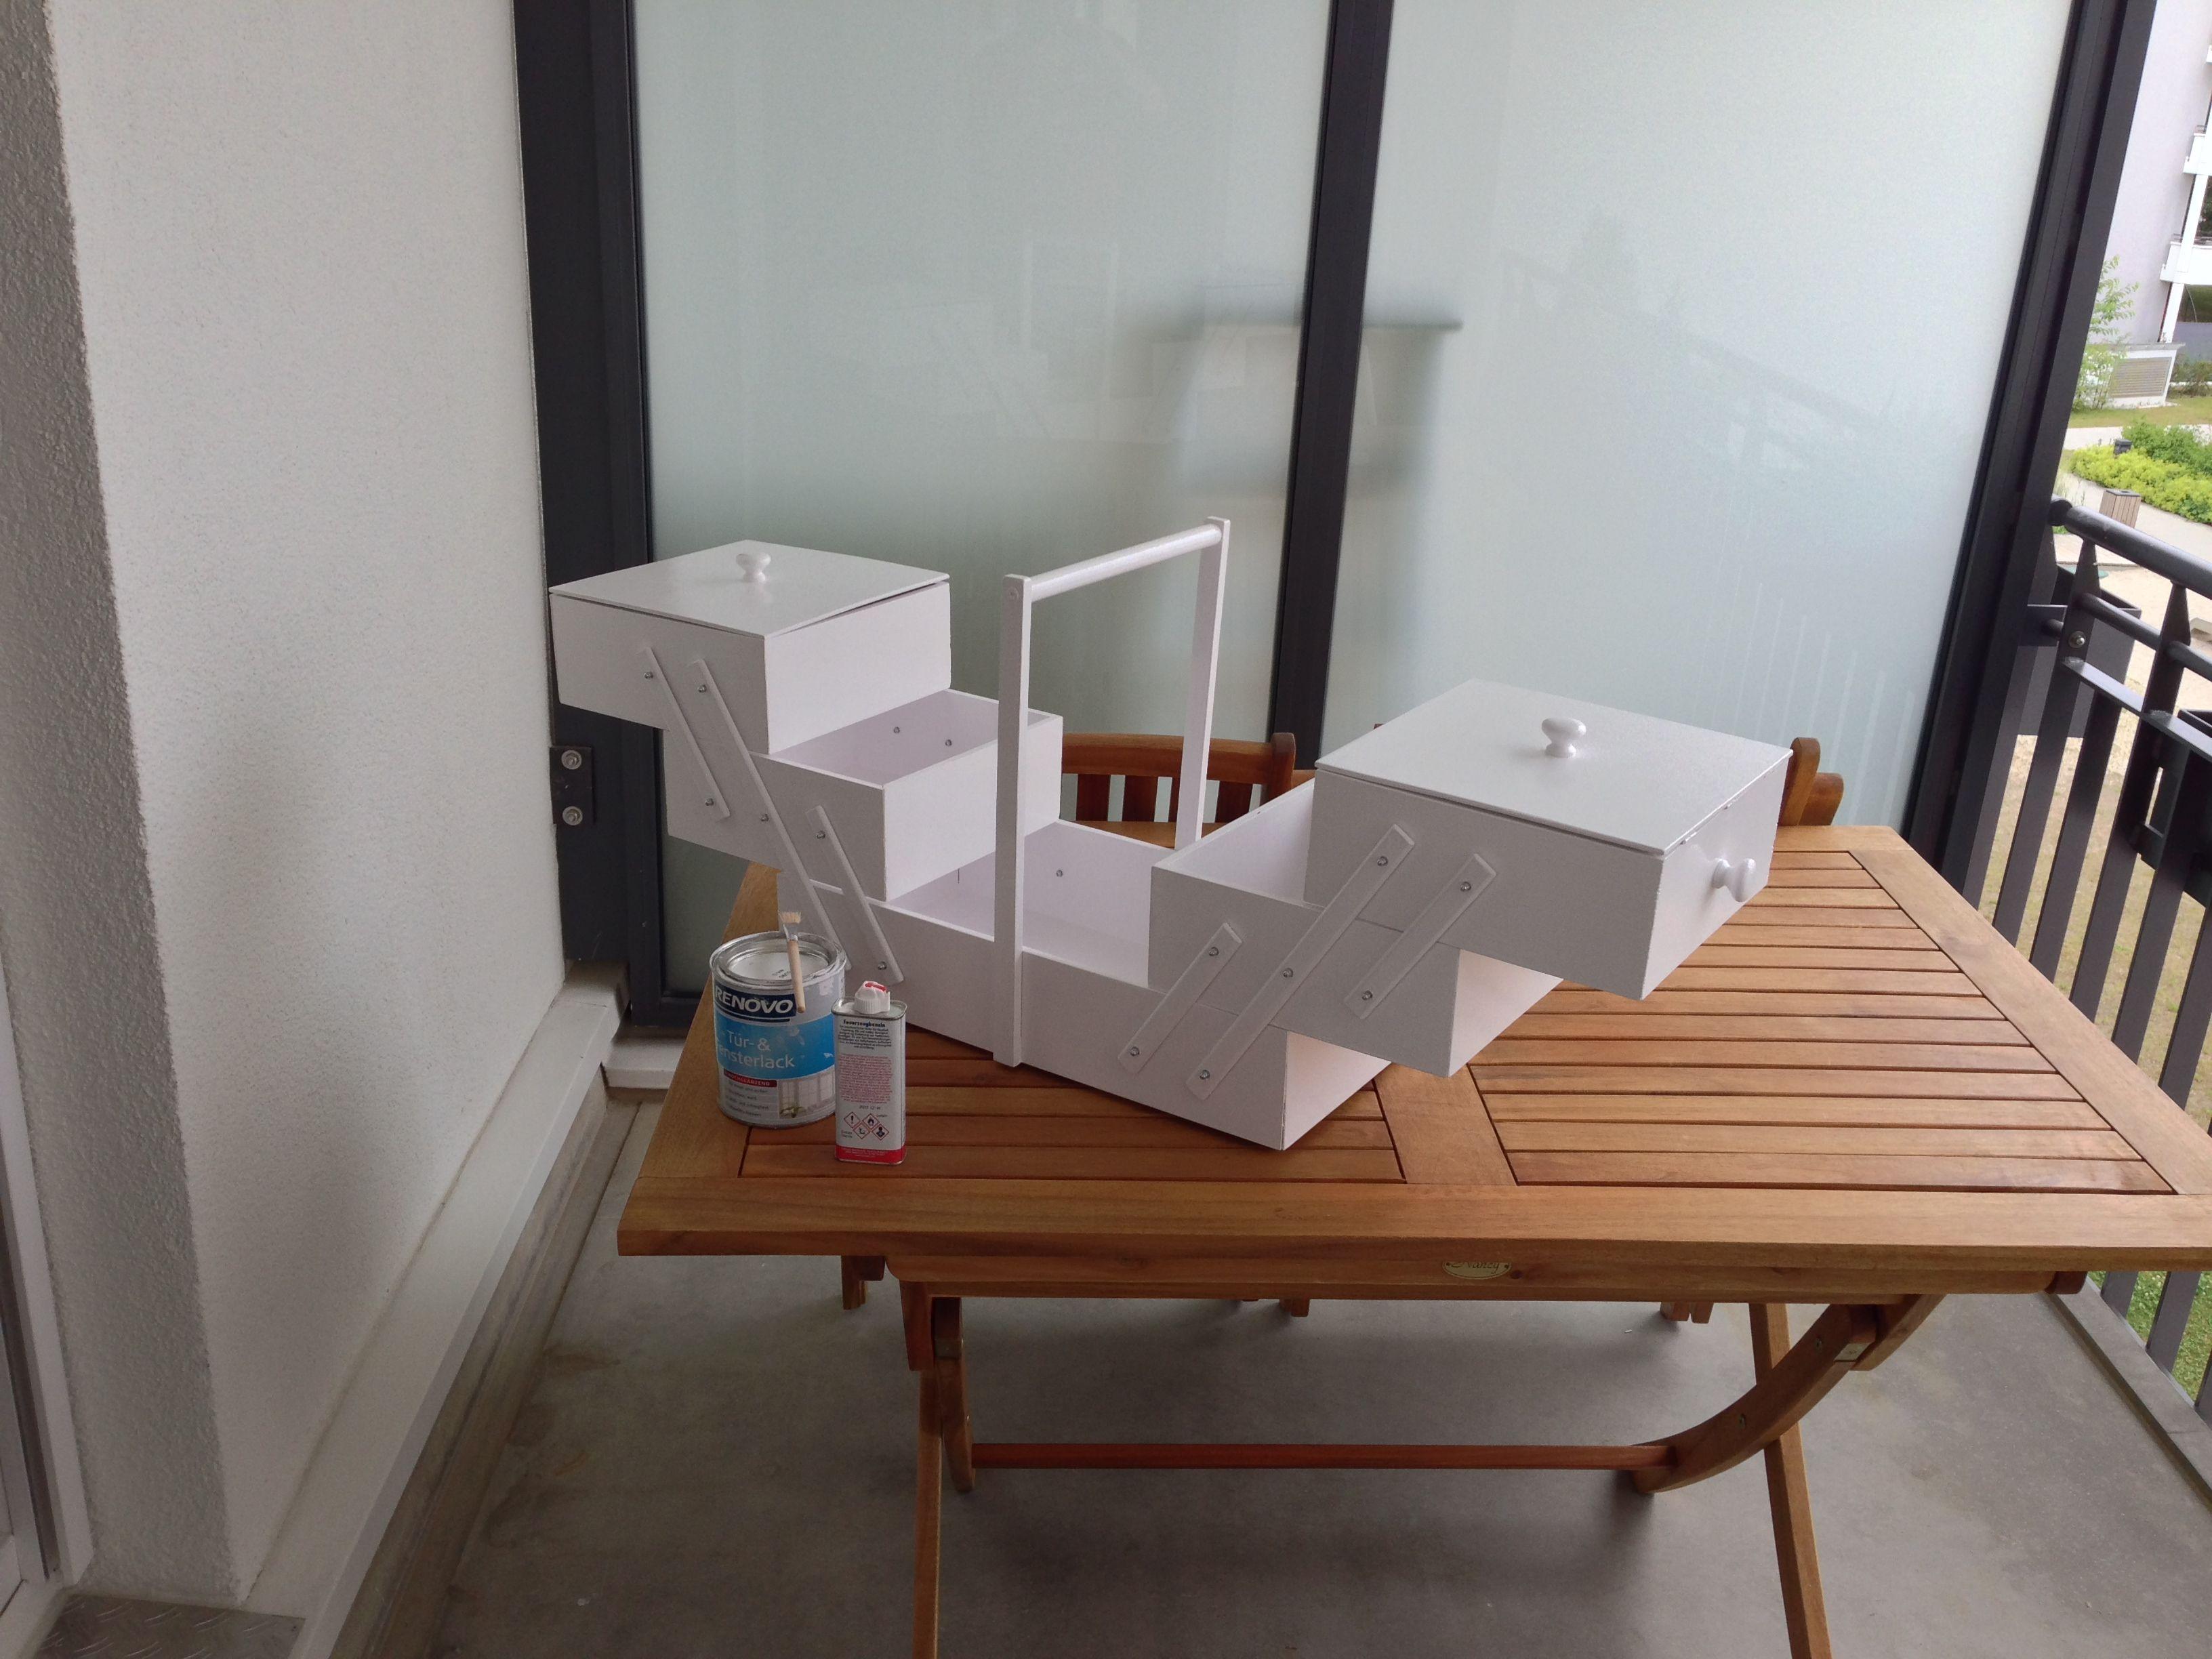 n hkasten n hk stchen bauanleitung zum selber bauen basteln pinterest n hkasten. Black Bedroom Furniture Sets. Home Design Ideas